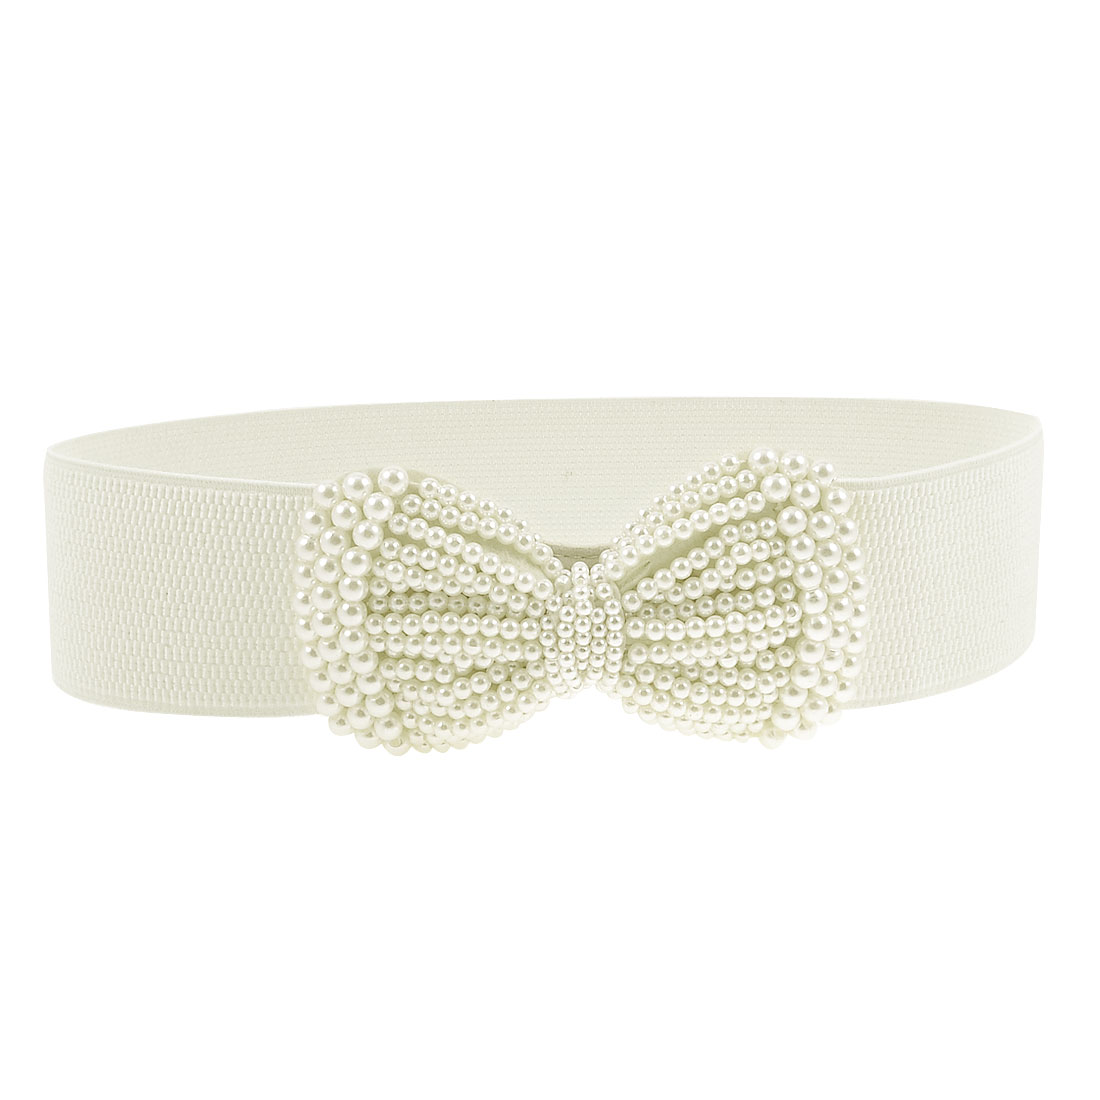 Ladies Faux Pearl Butterfly Knot Press Stud Button Elastic Waist Belt Beige Ivory